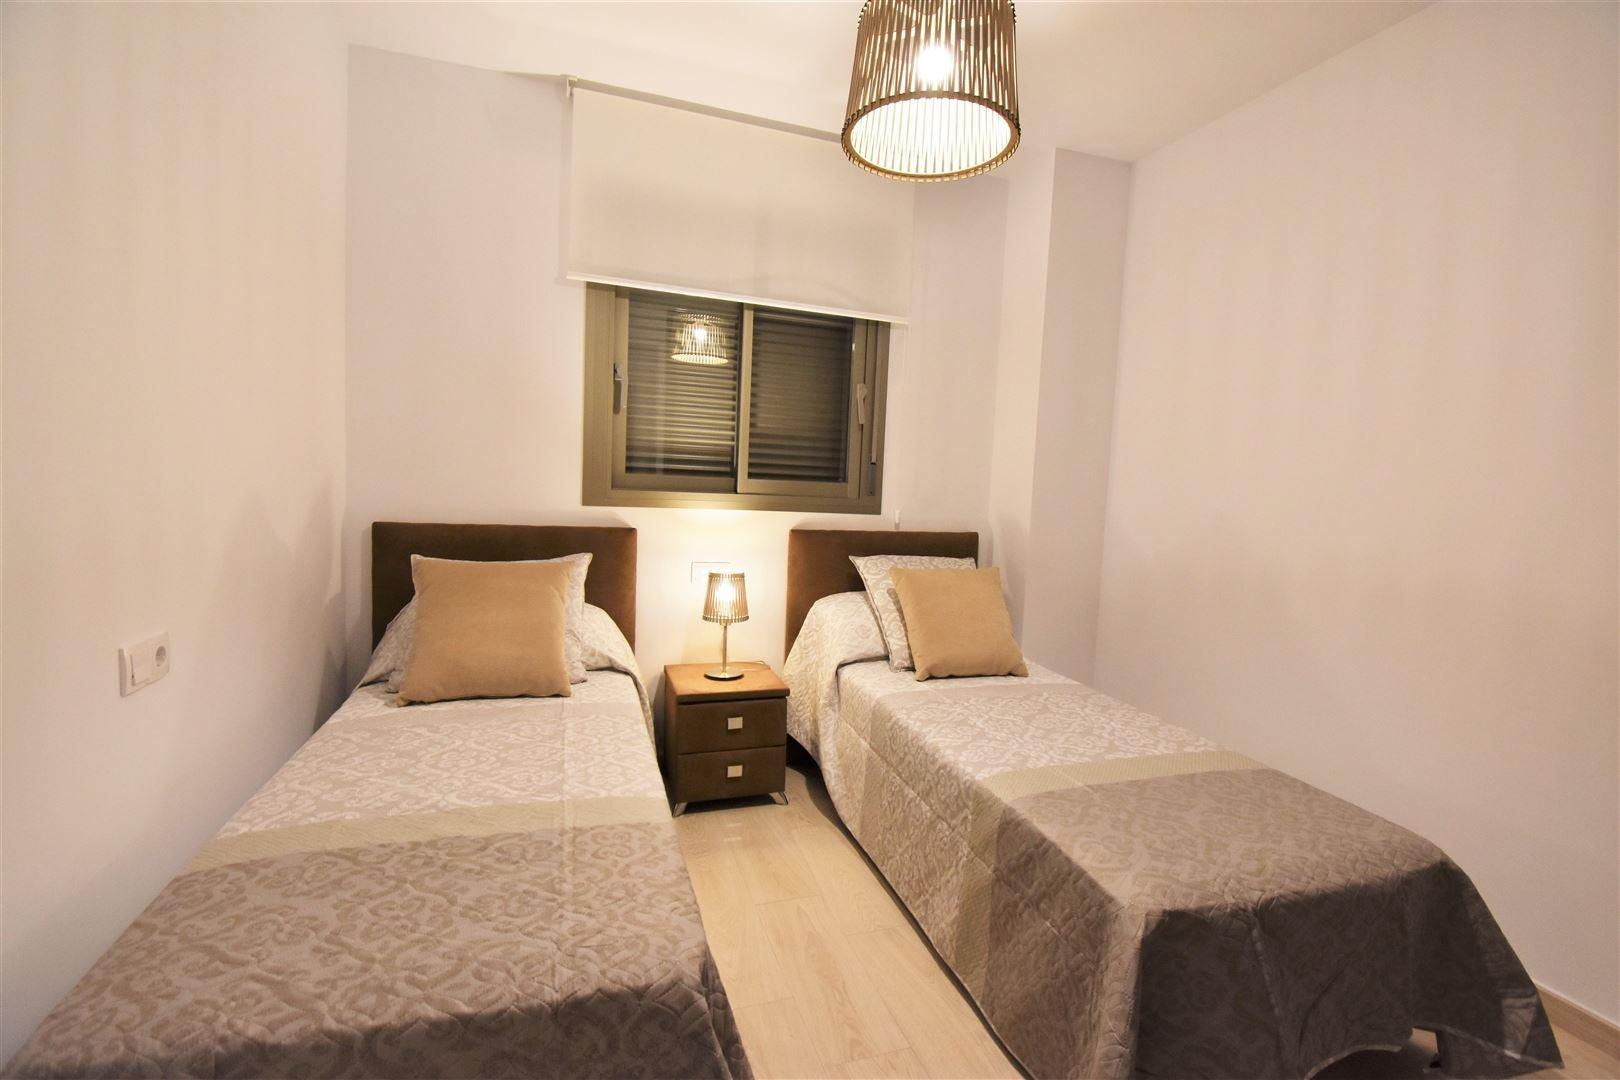 Foto 7 : Appartement te   (Spanje) - Prijs € 186.000